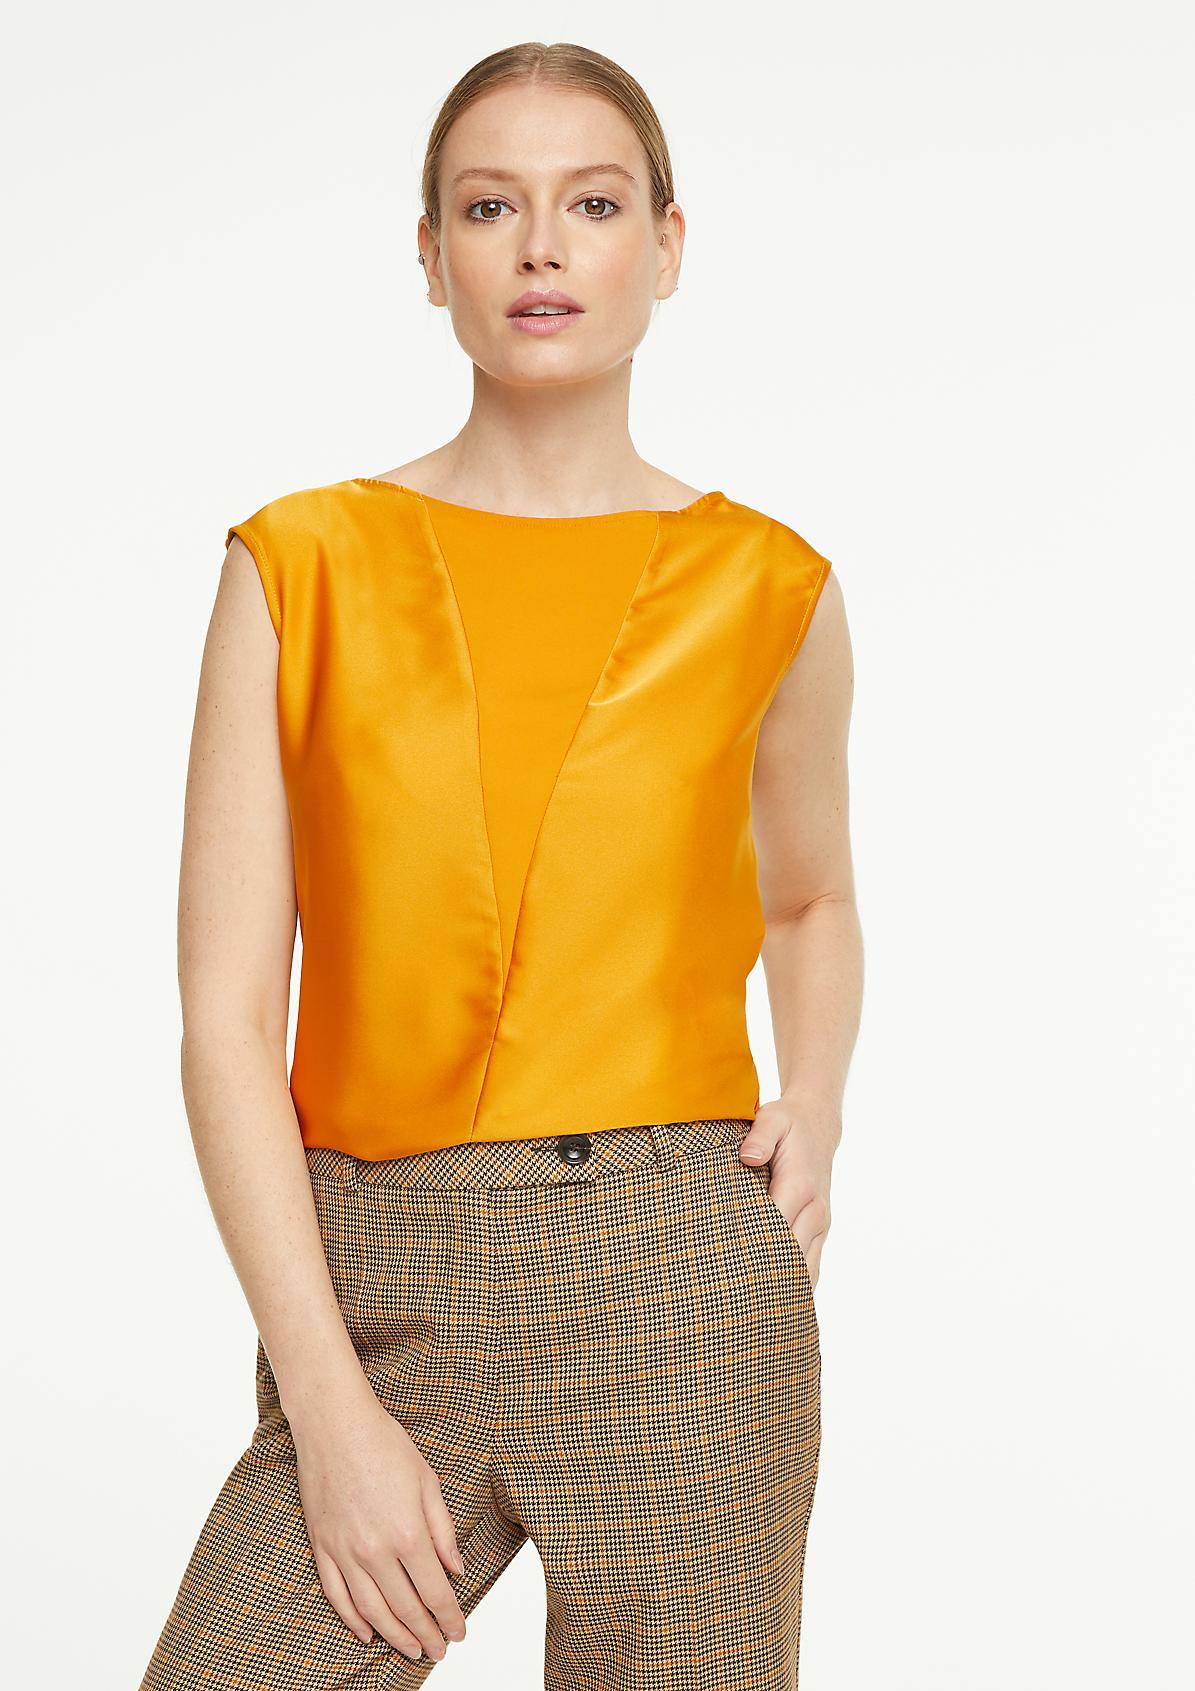 Fabric Mix-Shirt mit Satinfront